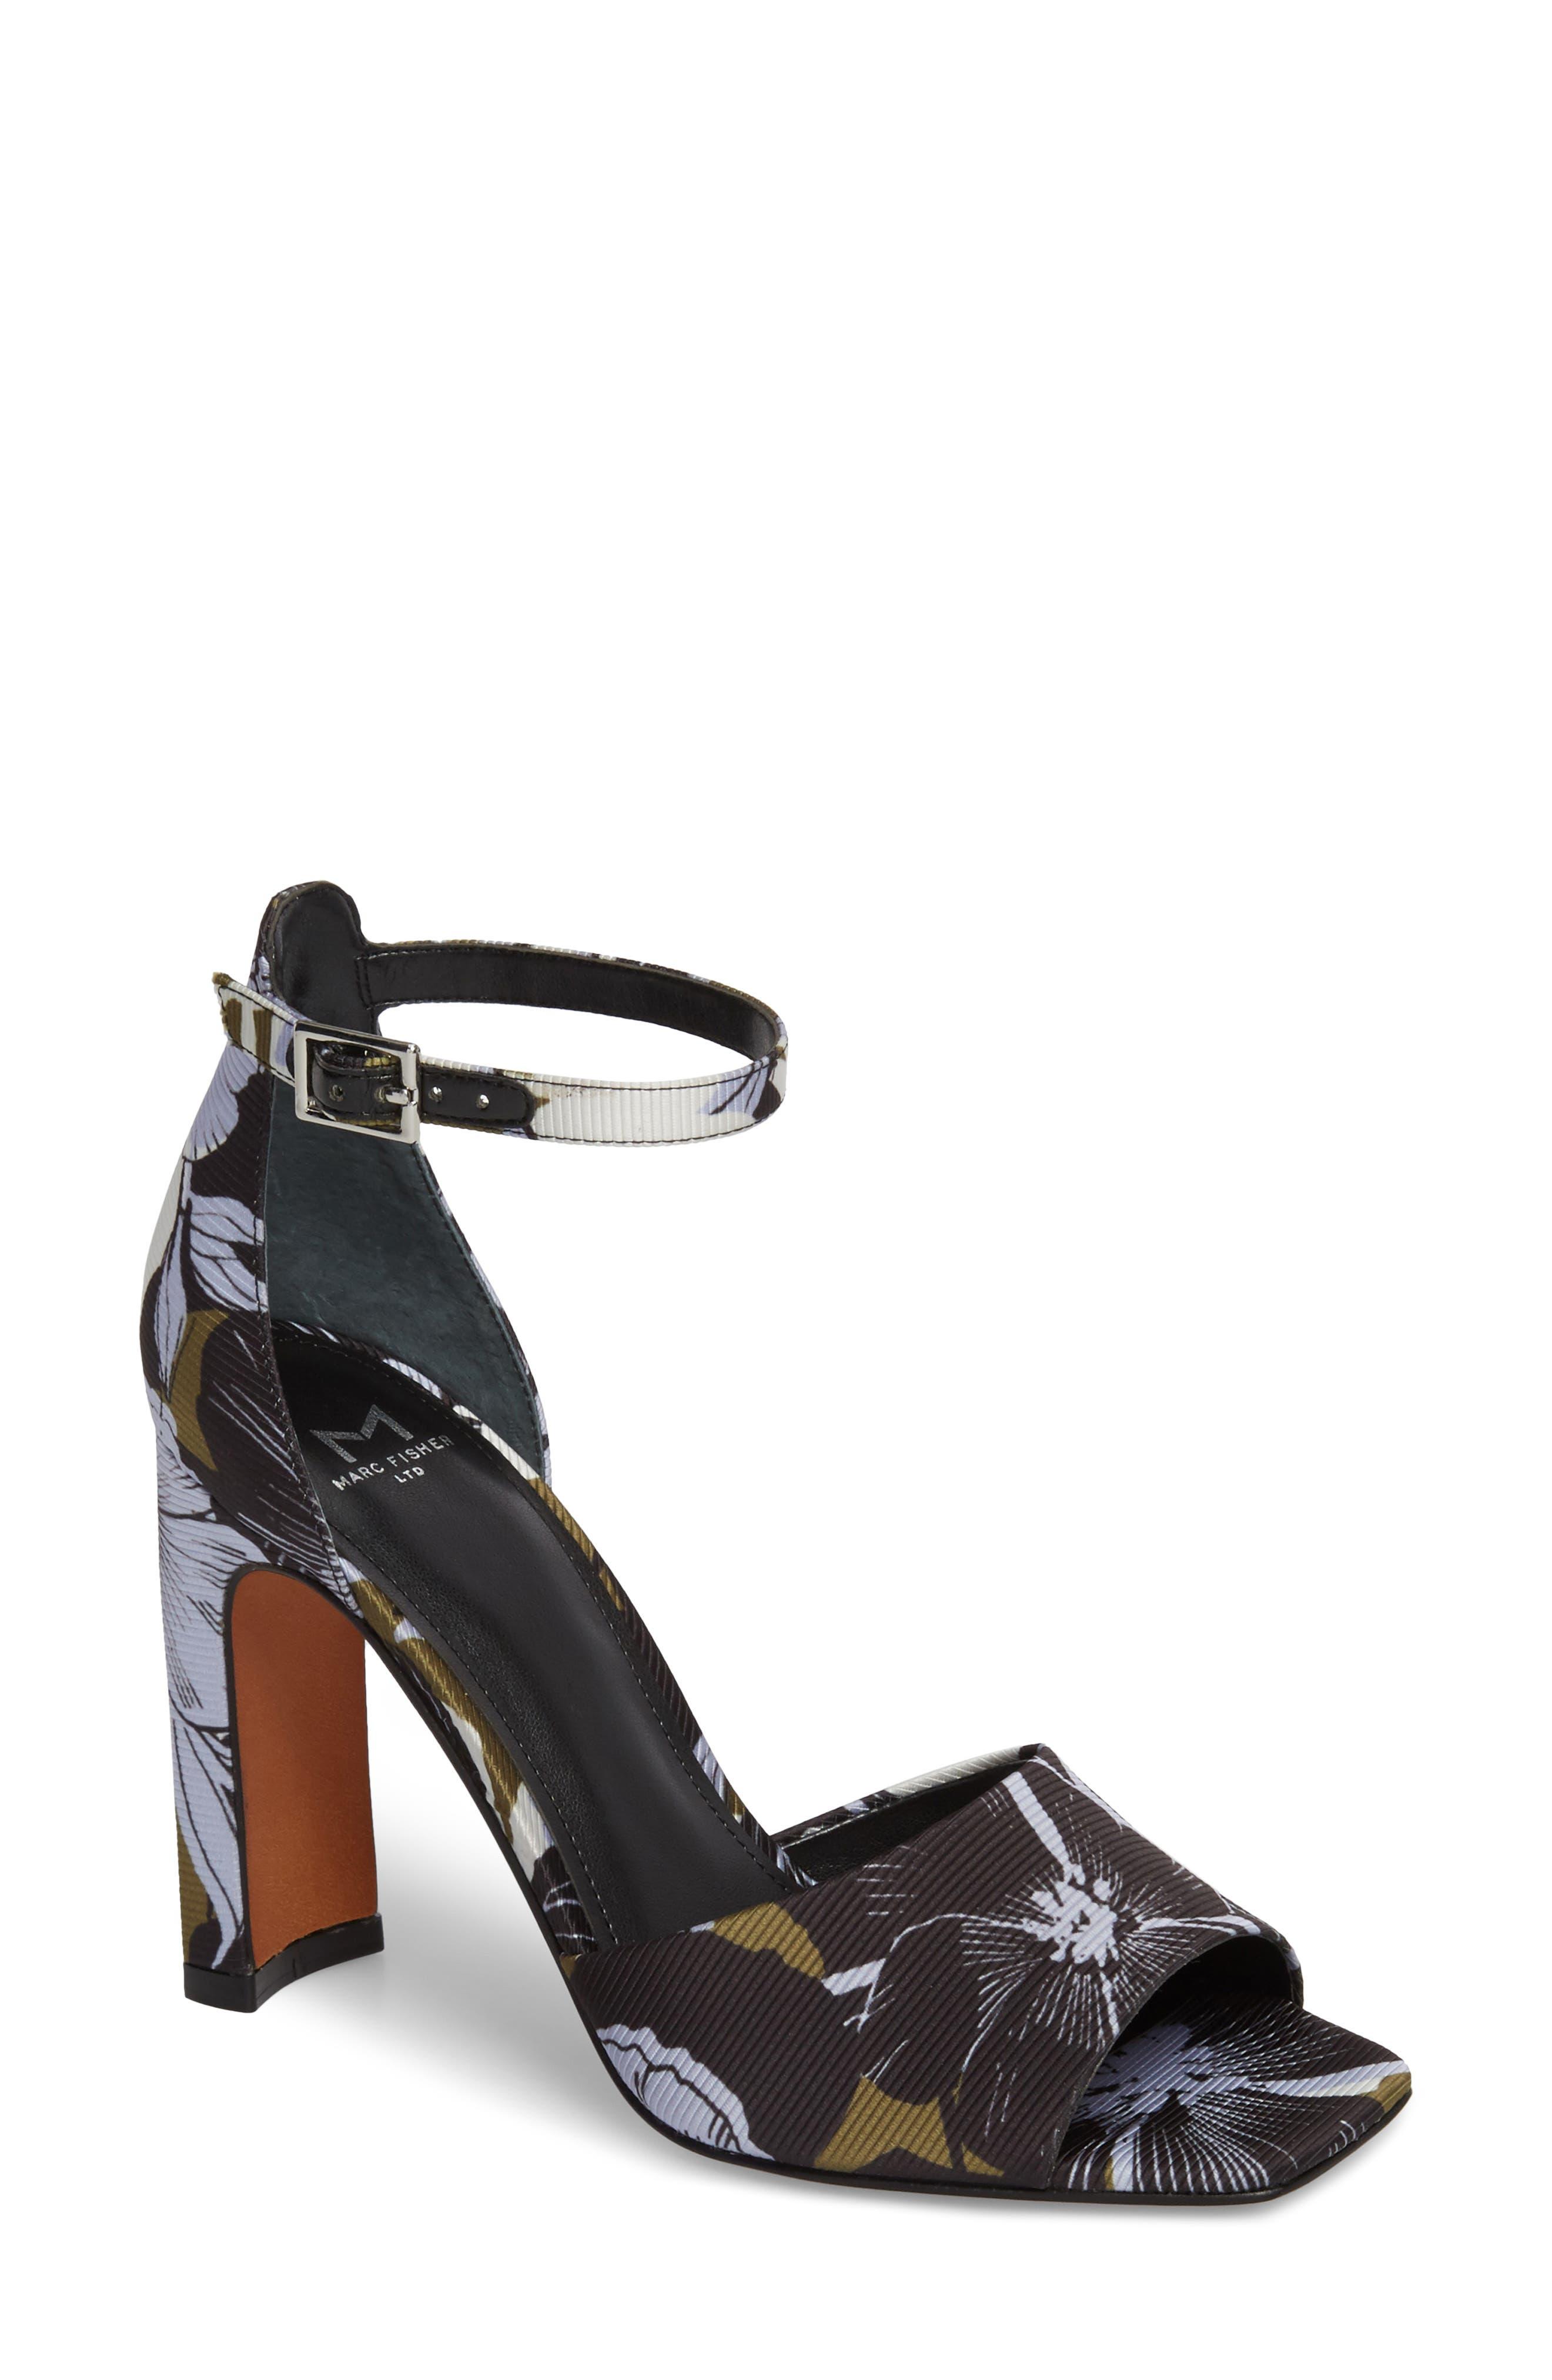 Harlin Ankle Strap Sandal,                         Main,                         color, Jungle Print Fabric